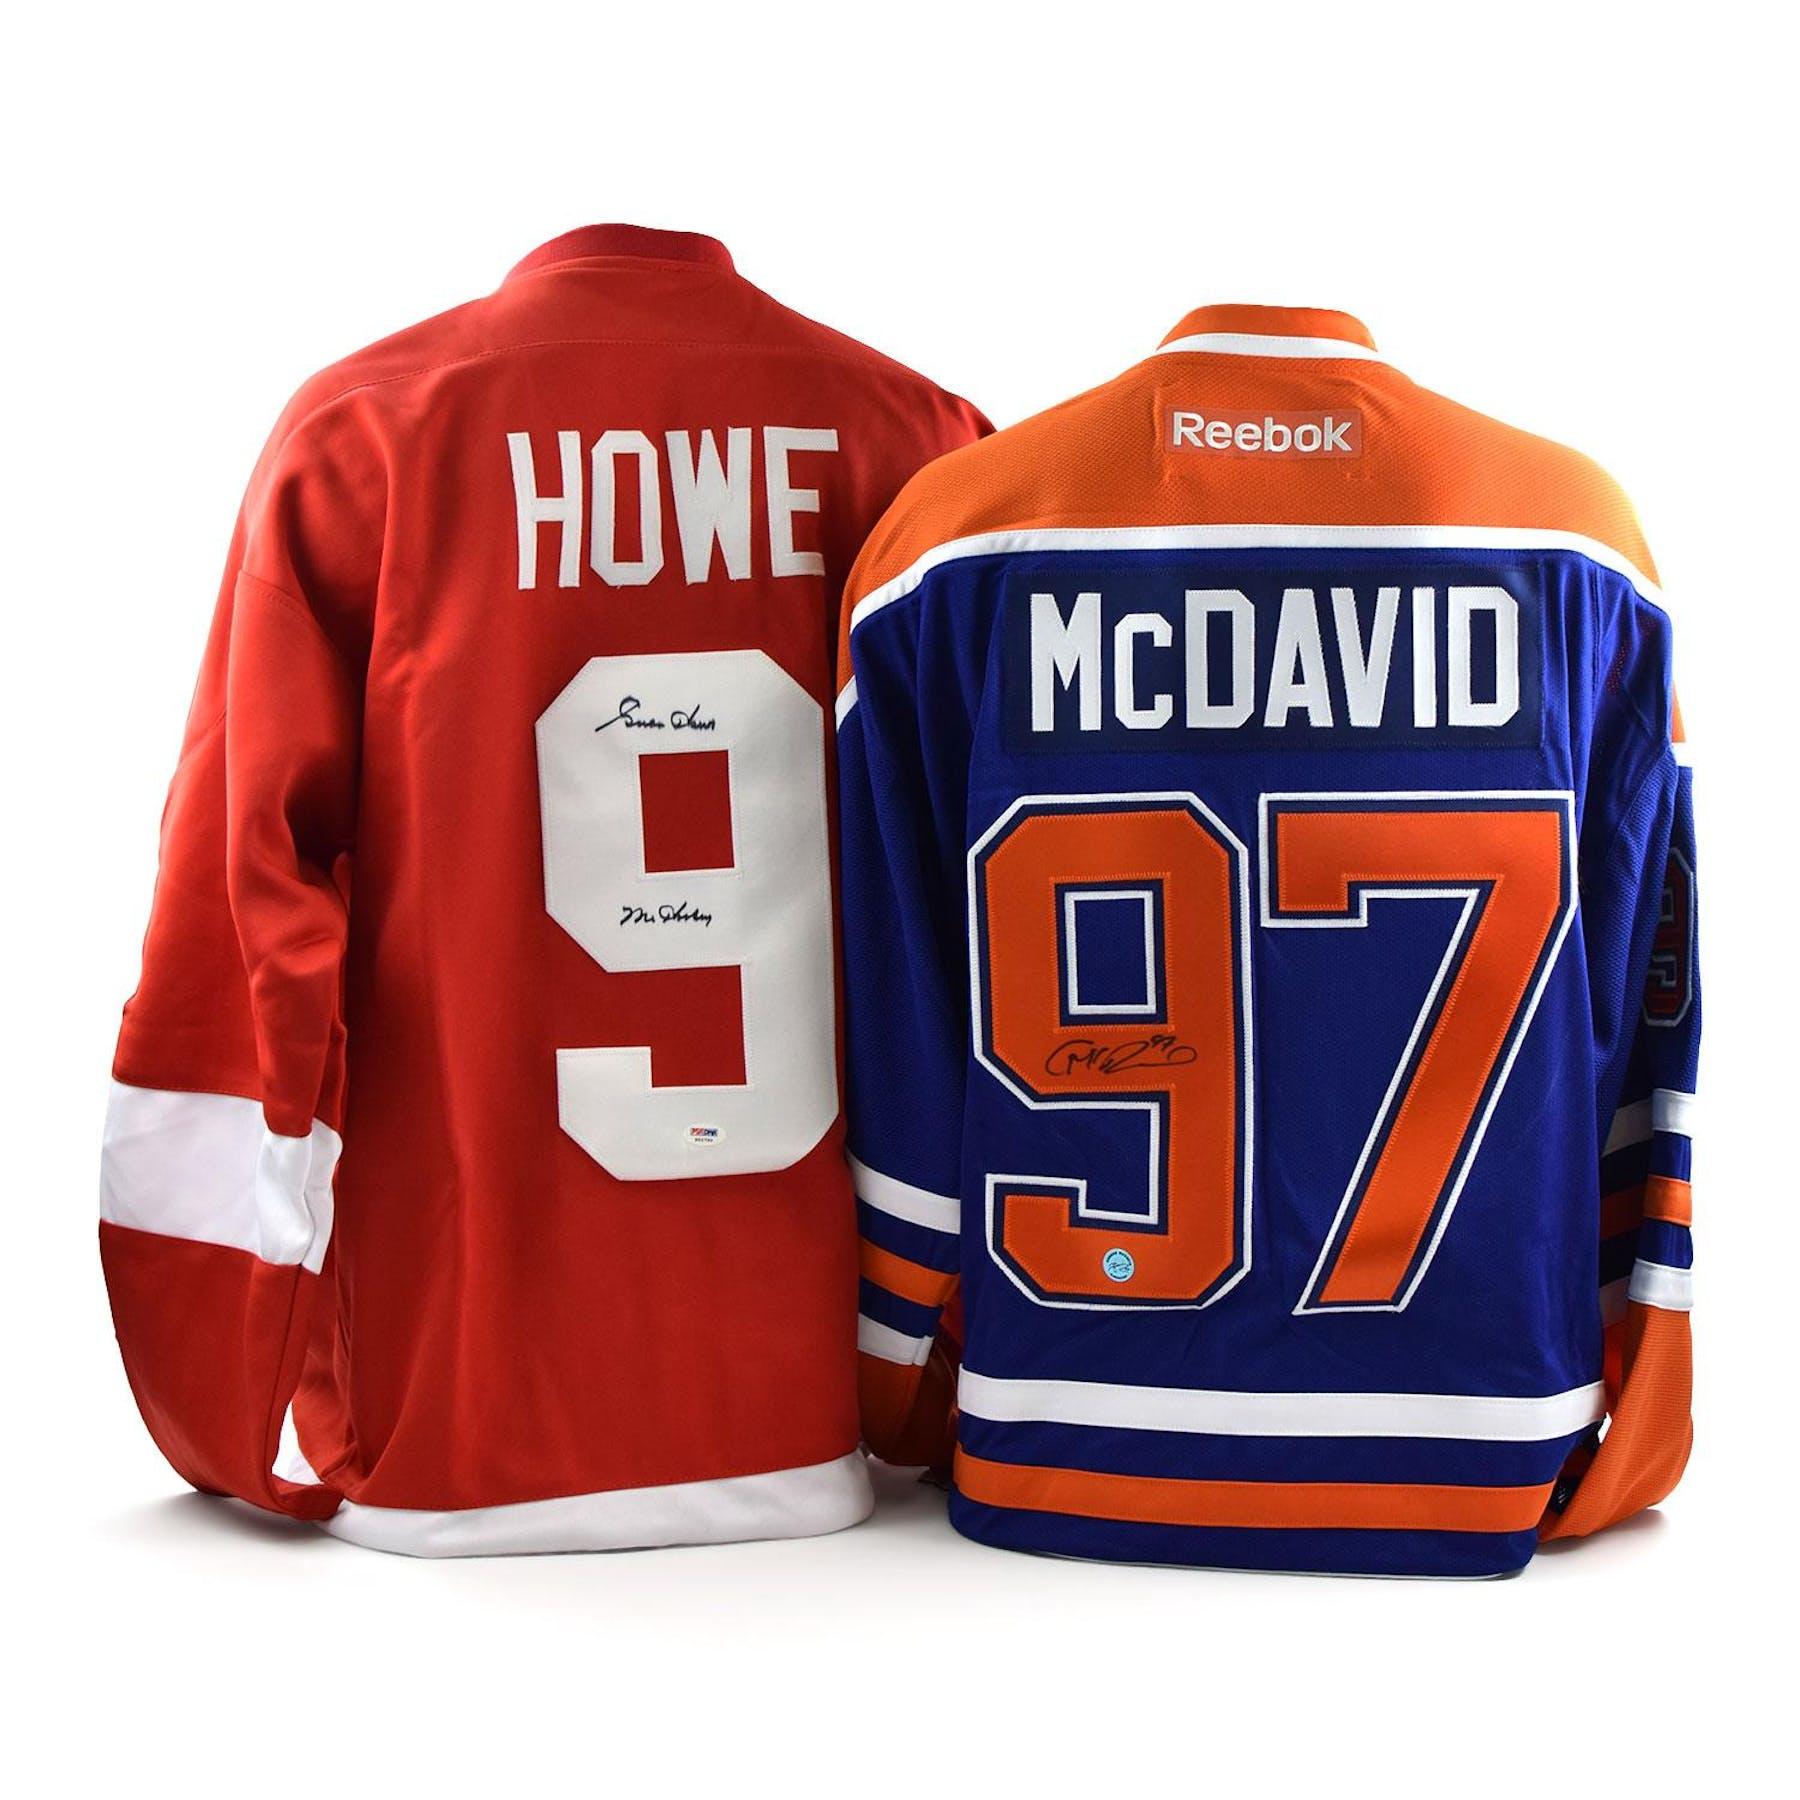 online retailer 75ce9 f45f9 2018/19 Hit Parade Autographed Hockey Jersey BEST OF 7 Hobby Box - Series 1  - Gretzky, McDavid, & Matthews!!!